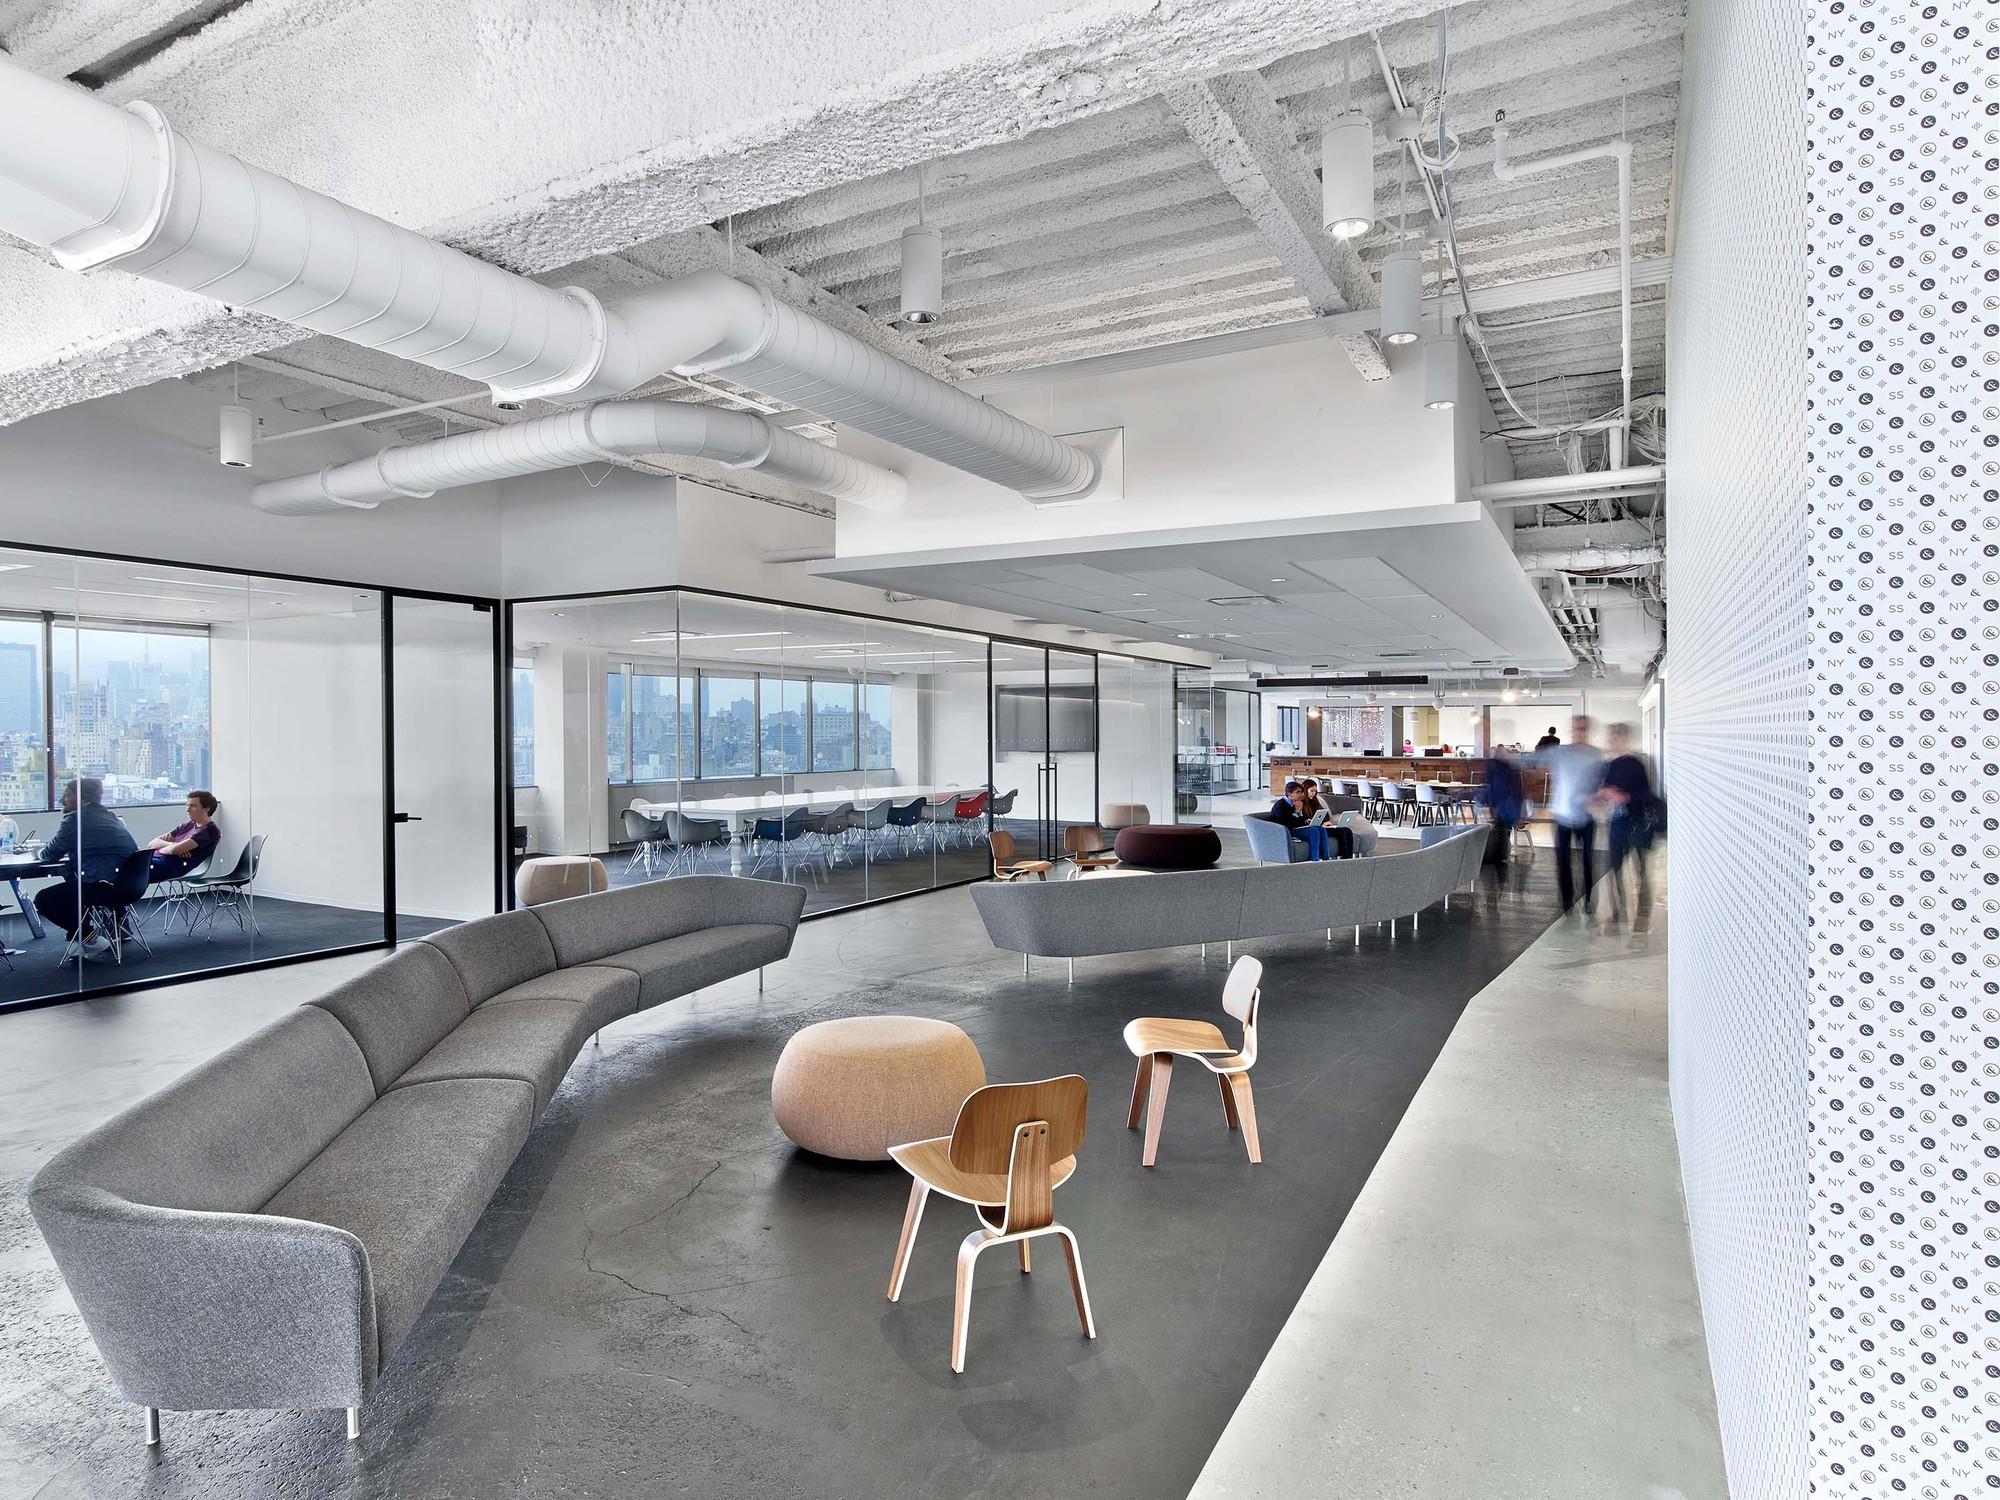 Interior Design Where To Start